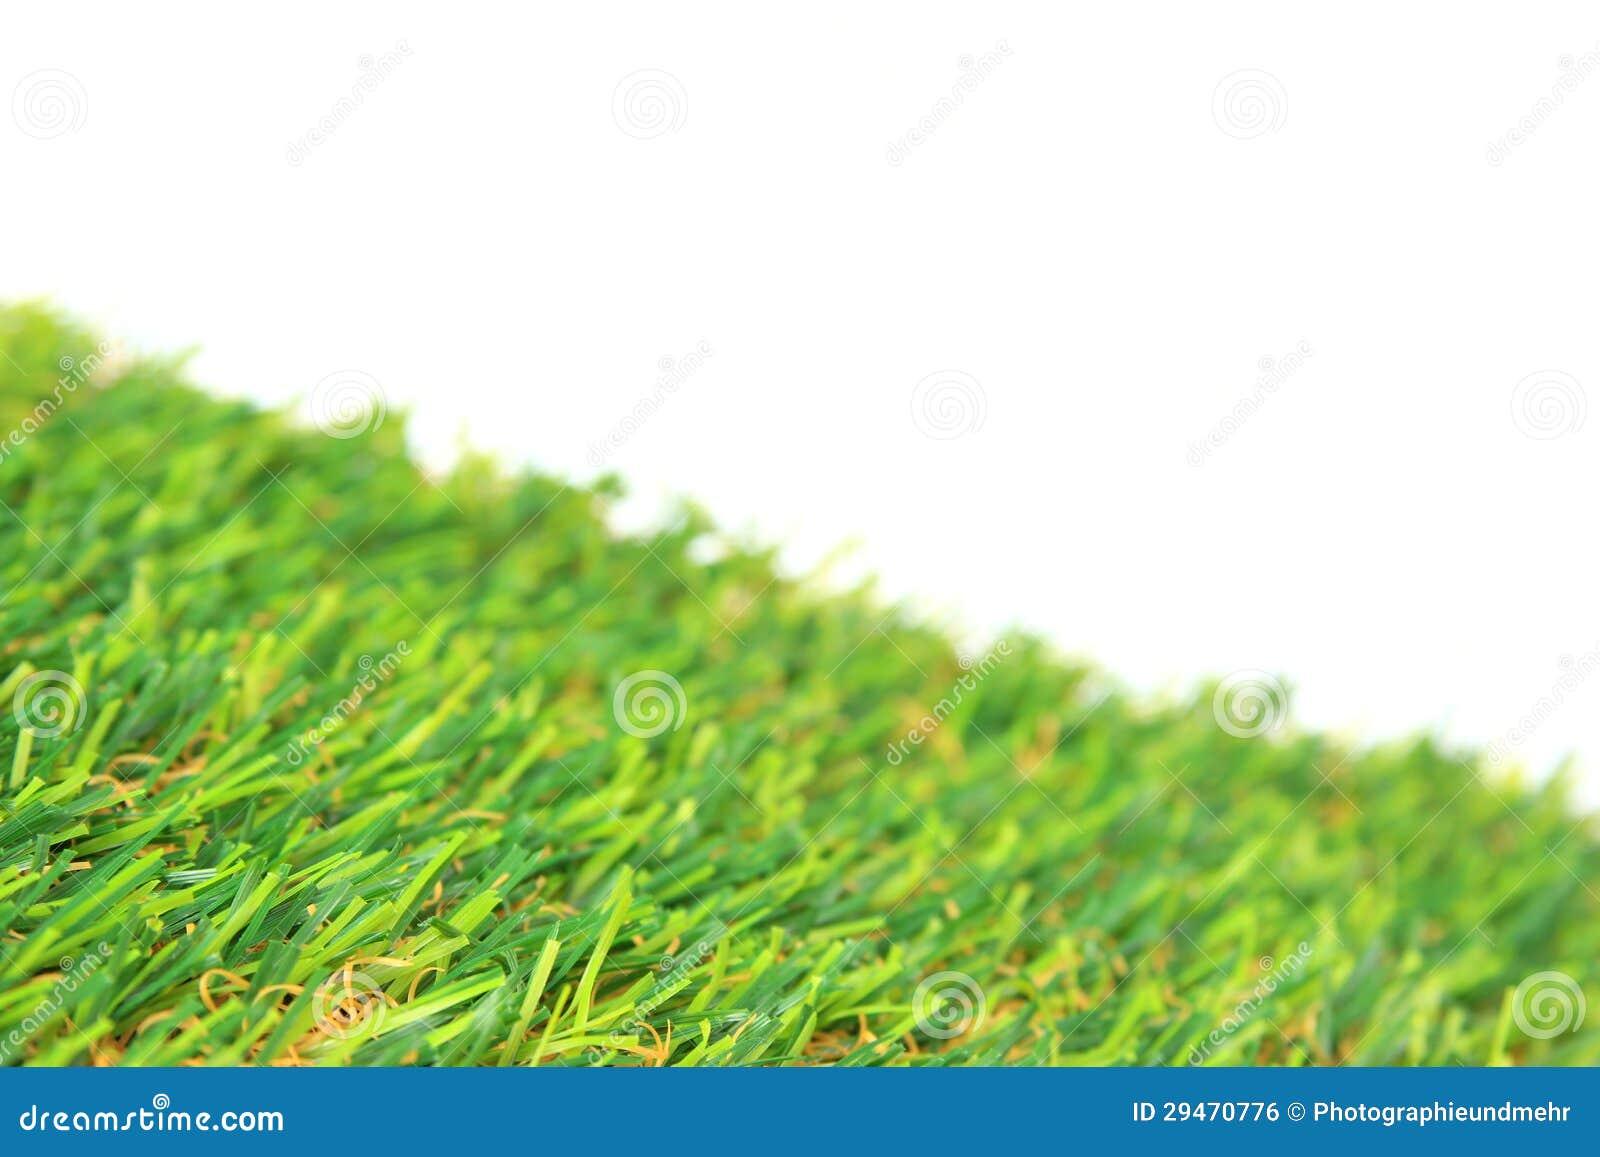 Synthetisch gras royalty vrije stock afbeelding afbeelding 29470776 - Verkoop synthetisch gras ...